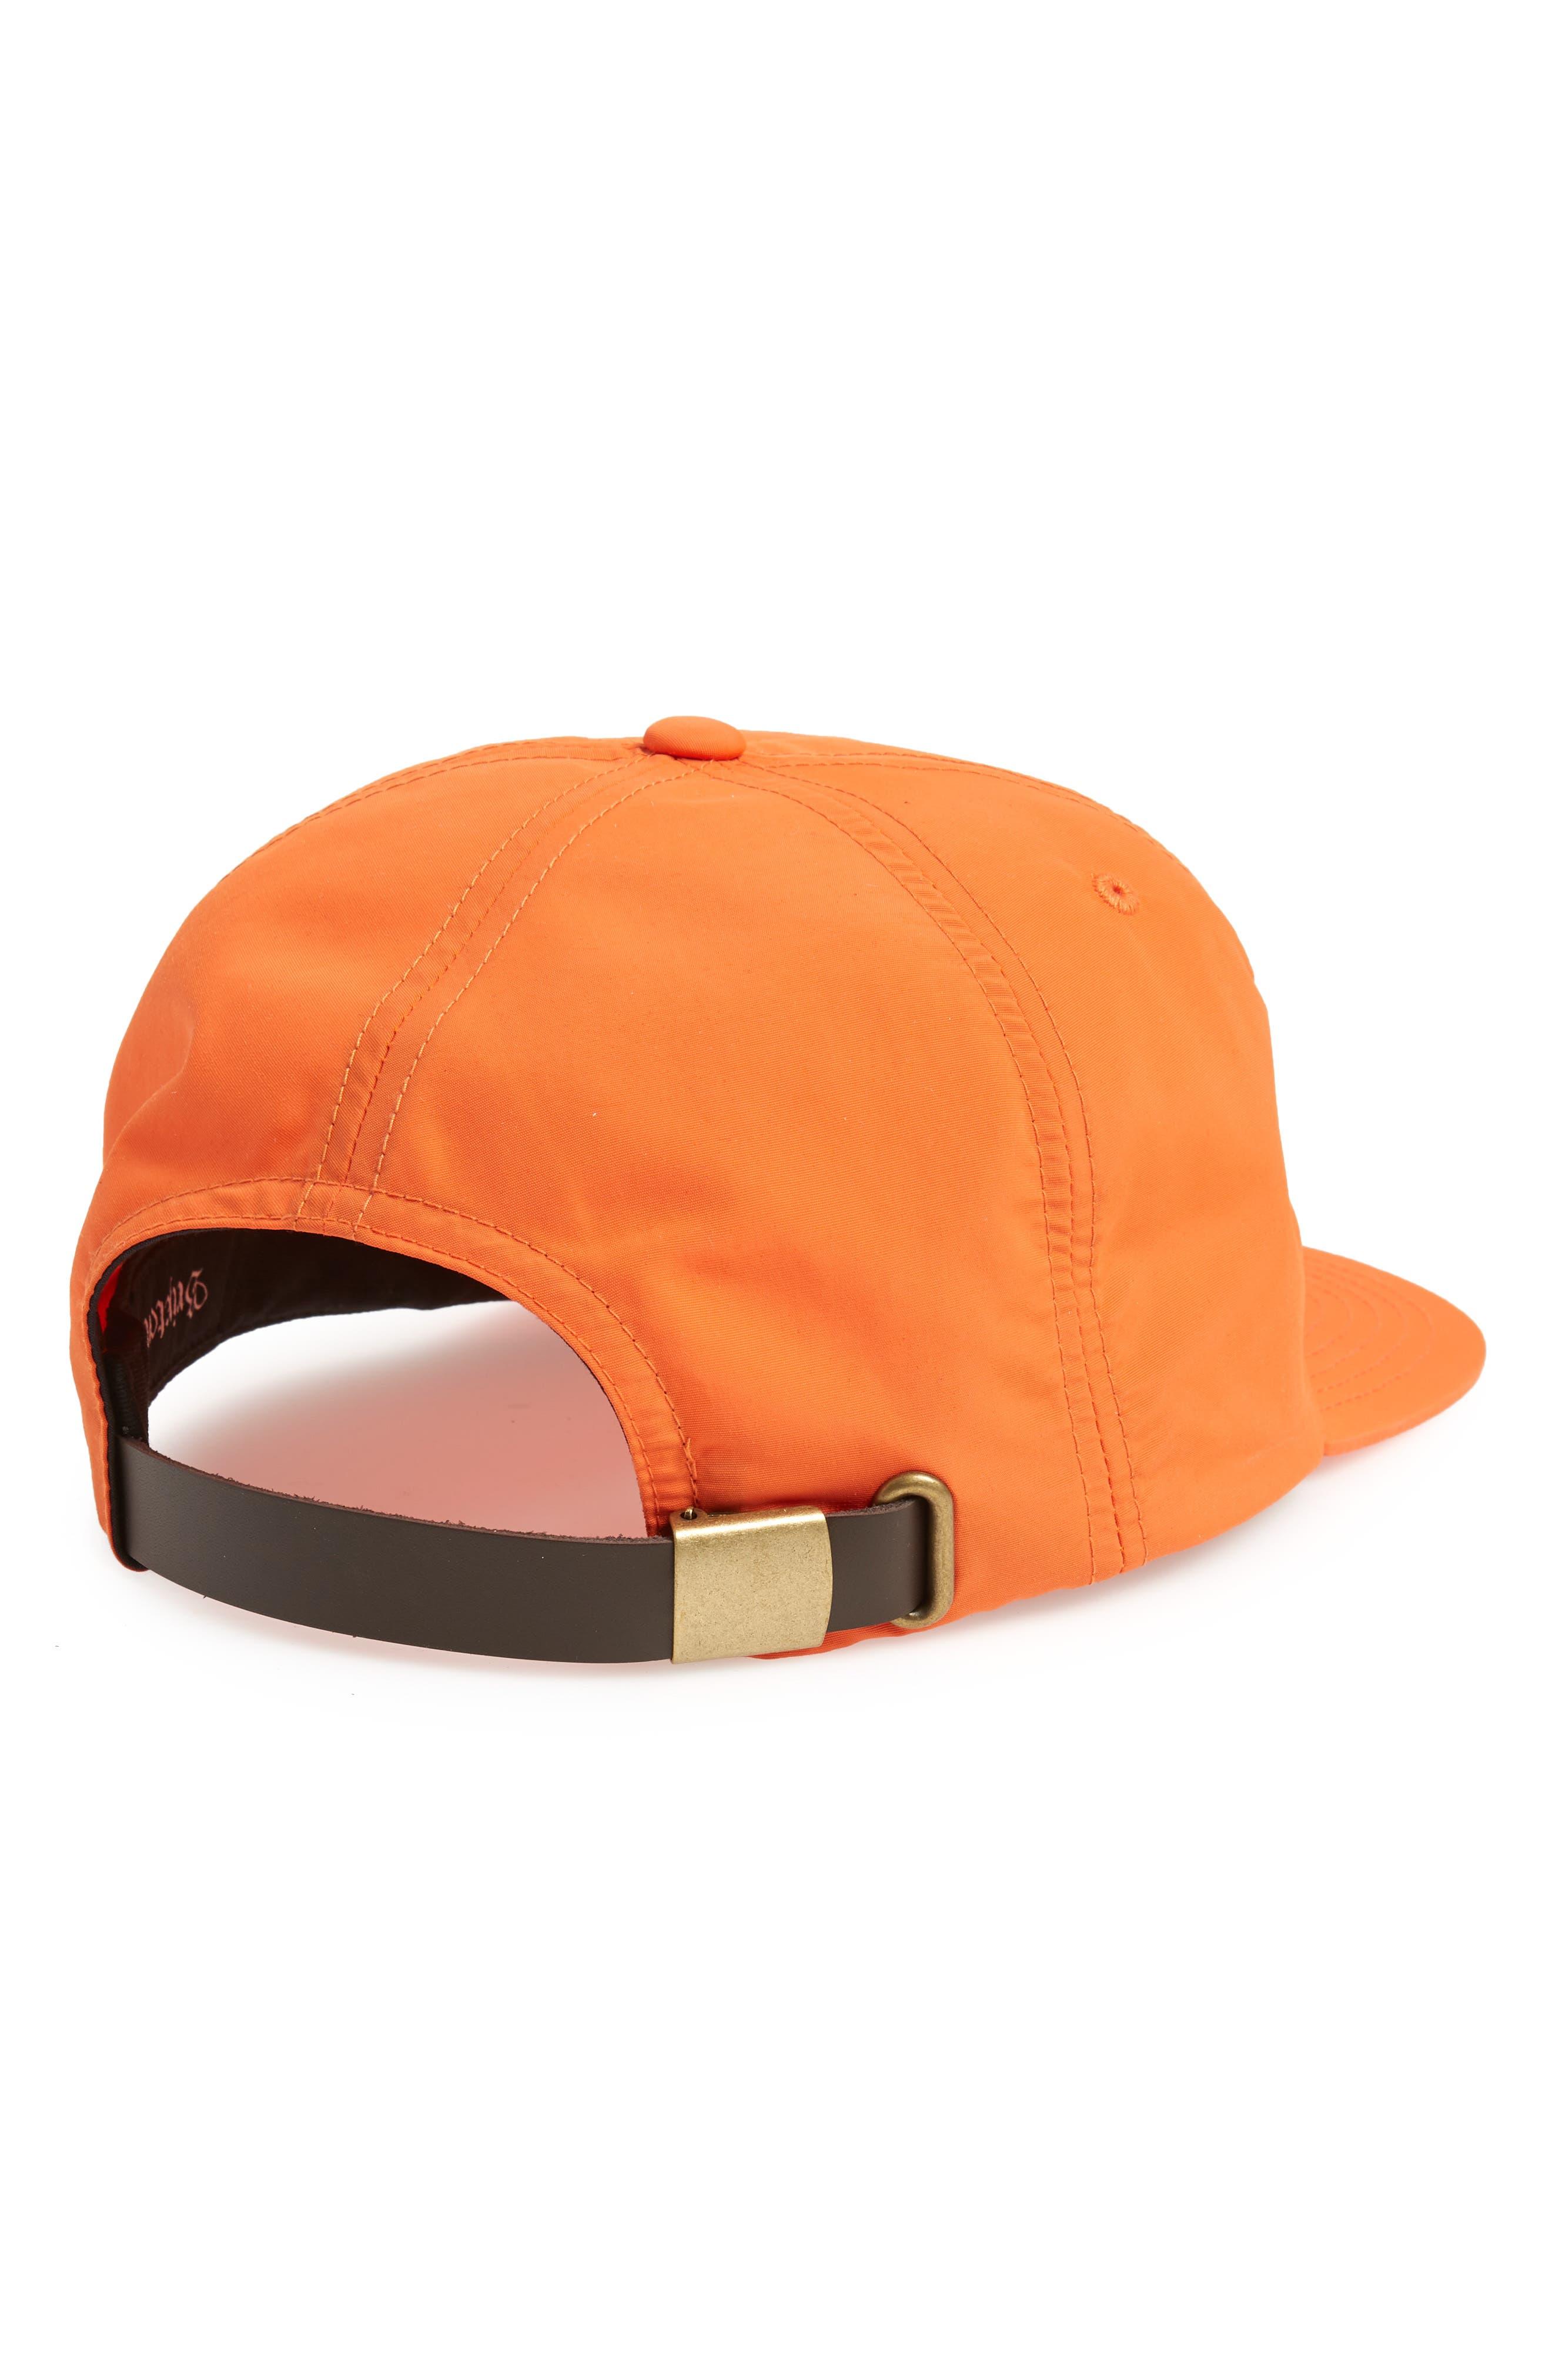 Blaine Ball Cap,                             Alternate thumbnail 2, color,                             Orange